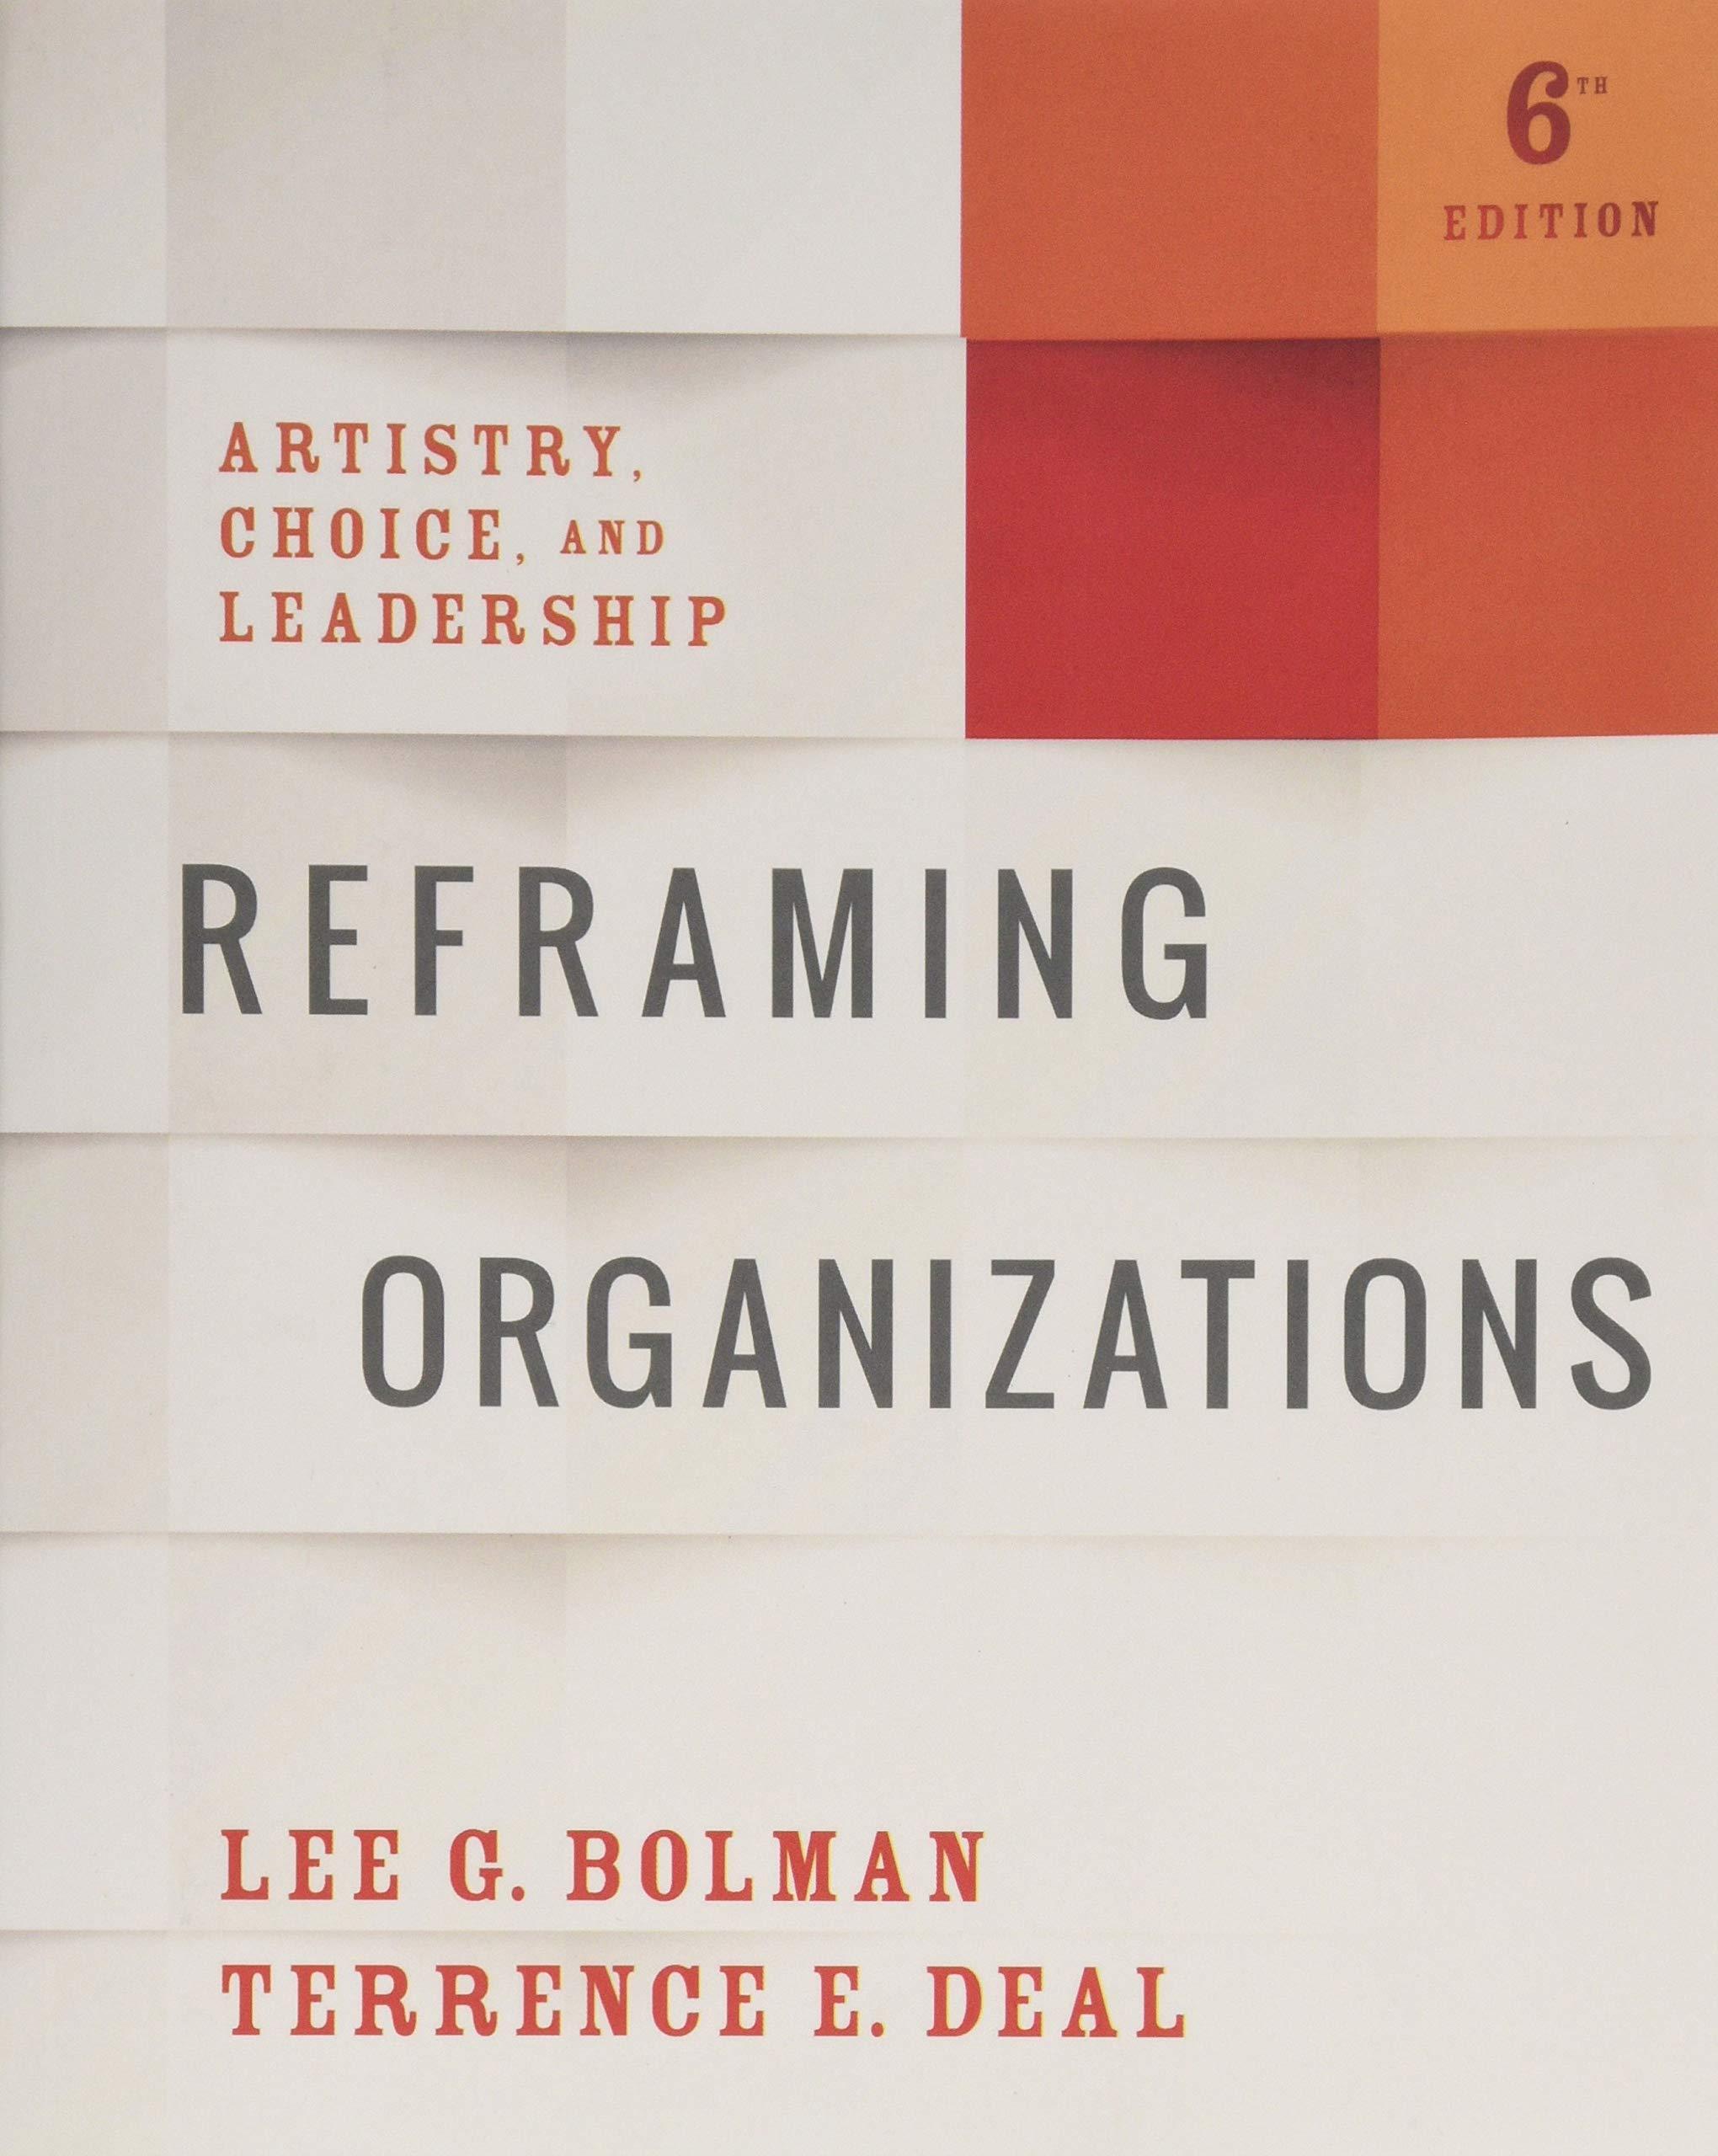 Reframing Organizations: Artistry, Choice, and Leadership by Jossey-Bass